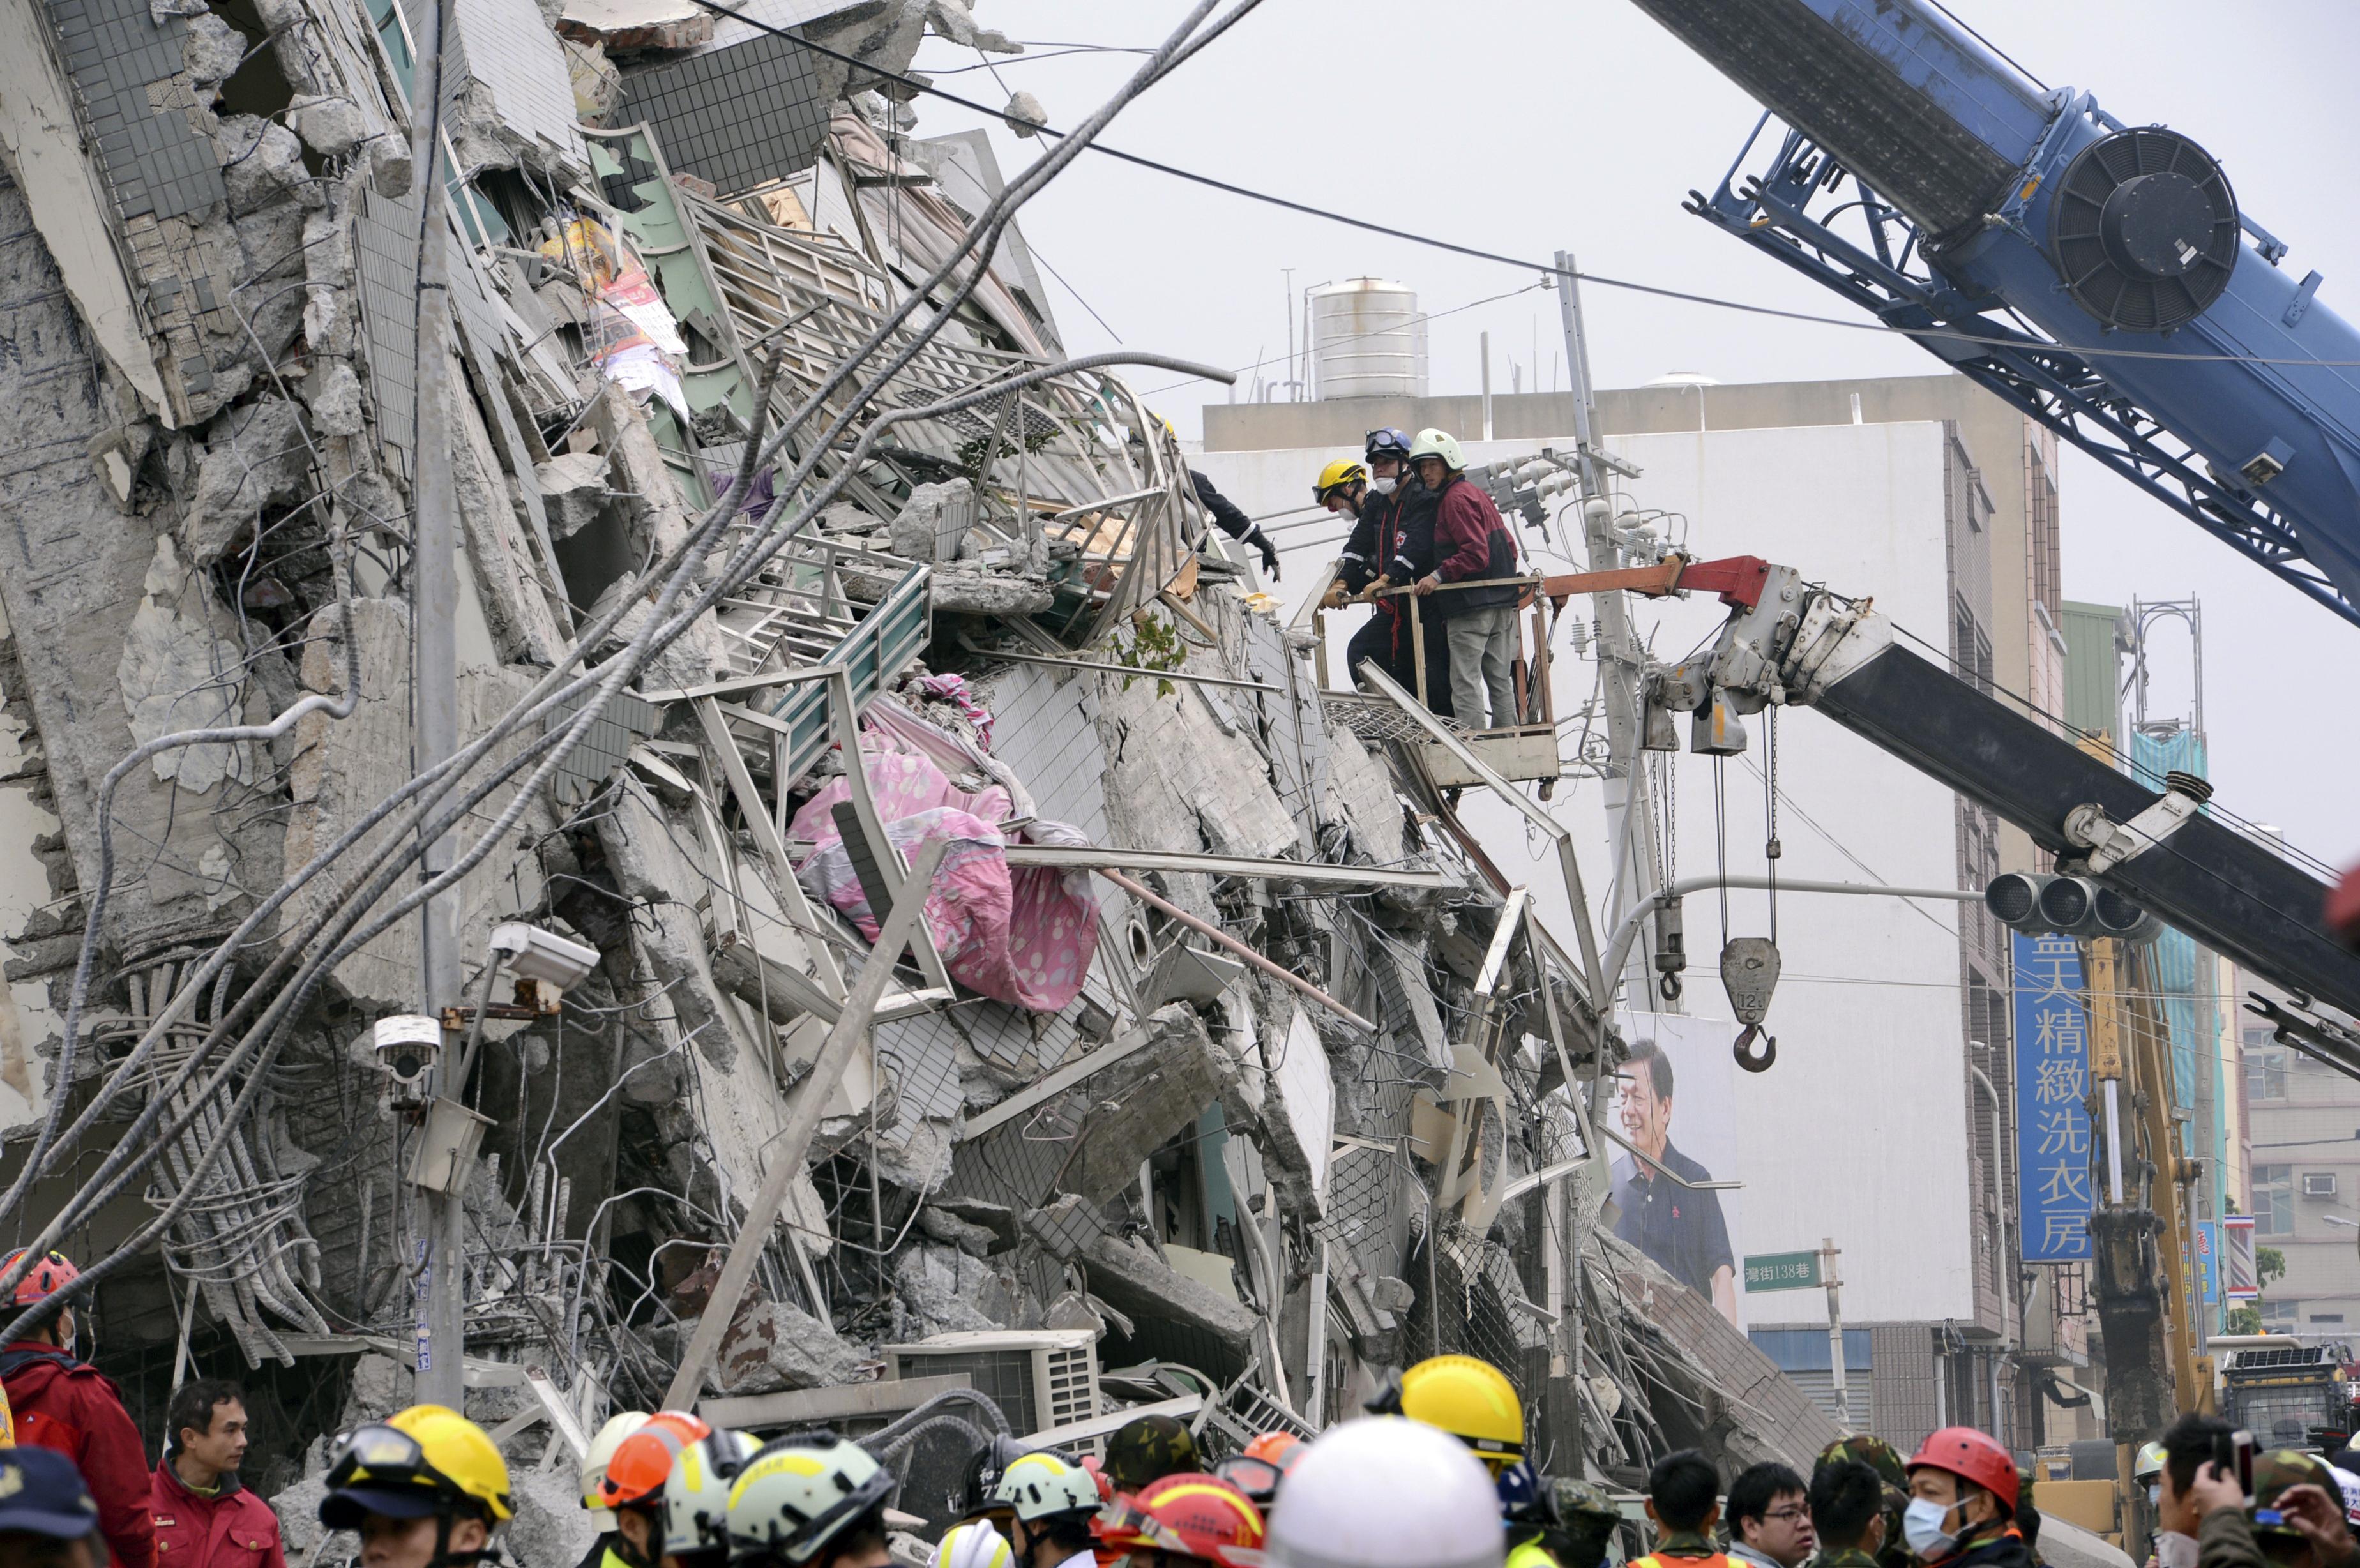 taiwan earthquake - photo #31